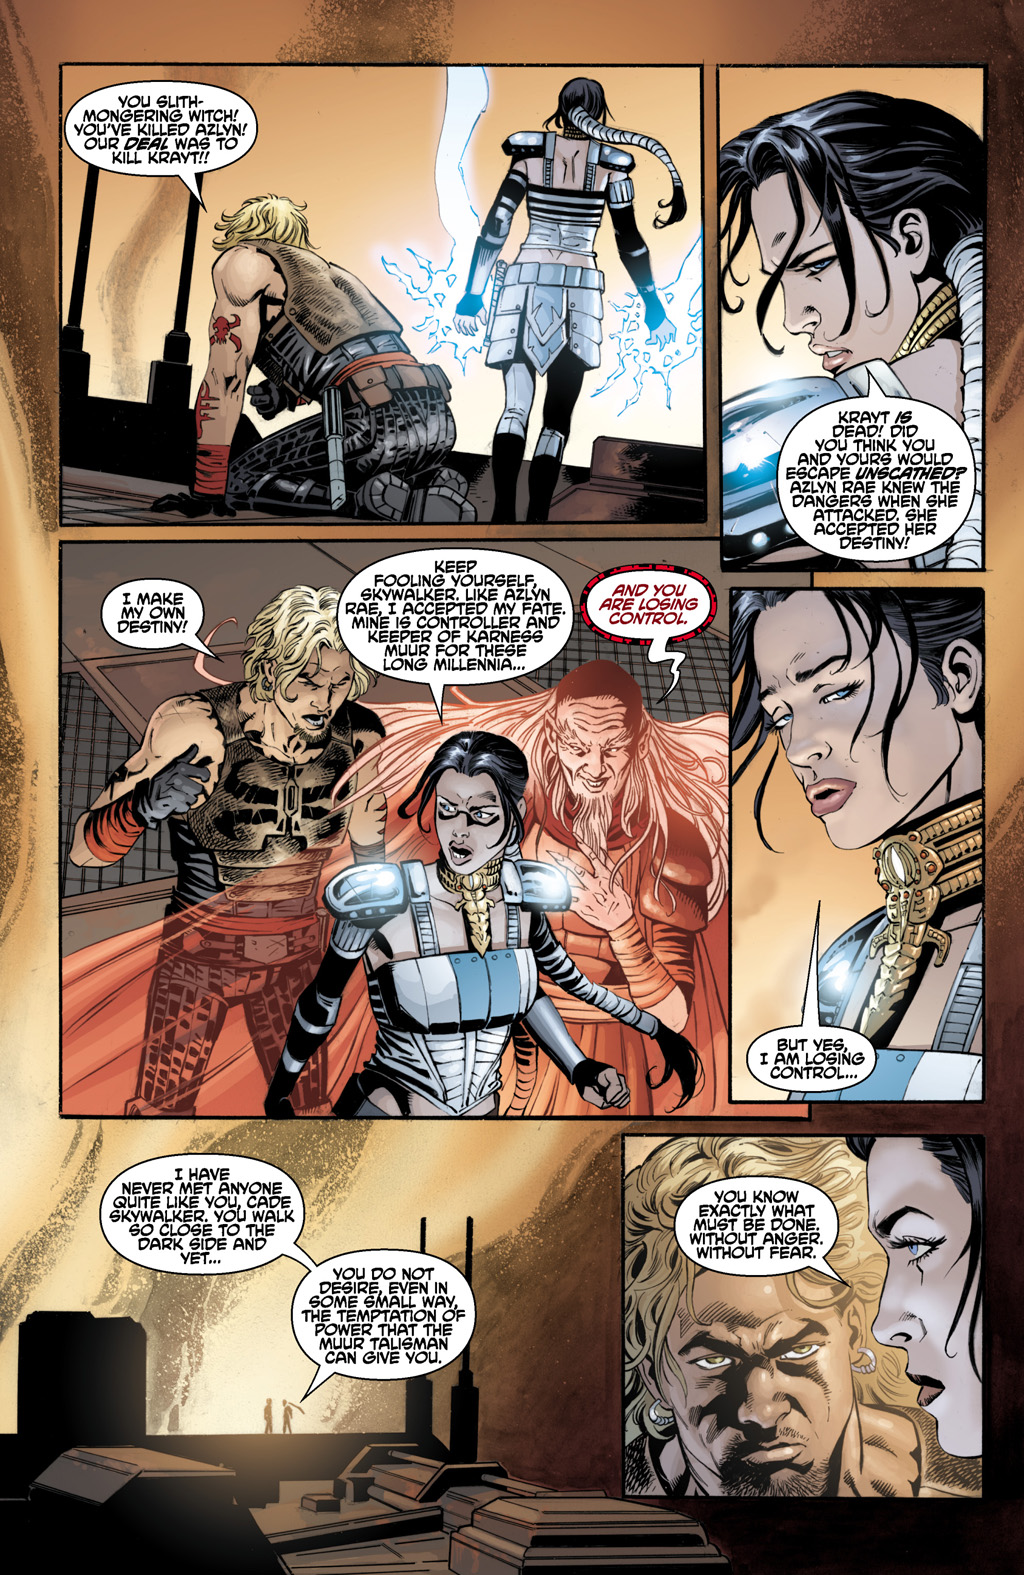 Darth Vader vs A'Sharad Hett - Page 5 LysZxf7TY4L9e6ADjSXoGESisp8TaO8bHo2M31QLx7wq158mHAPveOGf80PElXX9QXOzegbVZoFDZ3ITZHholiFacgf0p57mgYln2BEV7N58DosRo9ZSSrxWcpfdQIYIP6WbJWsL